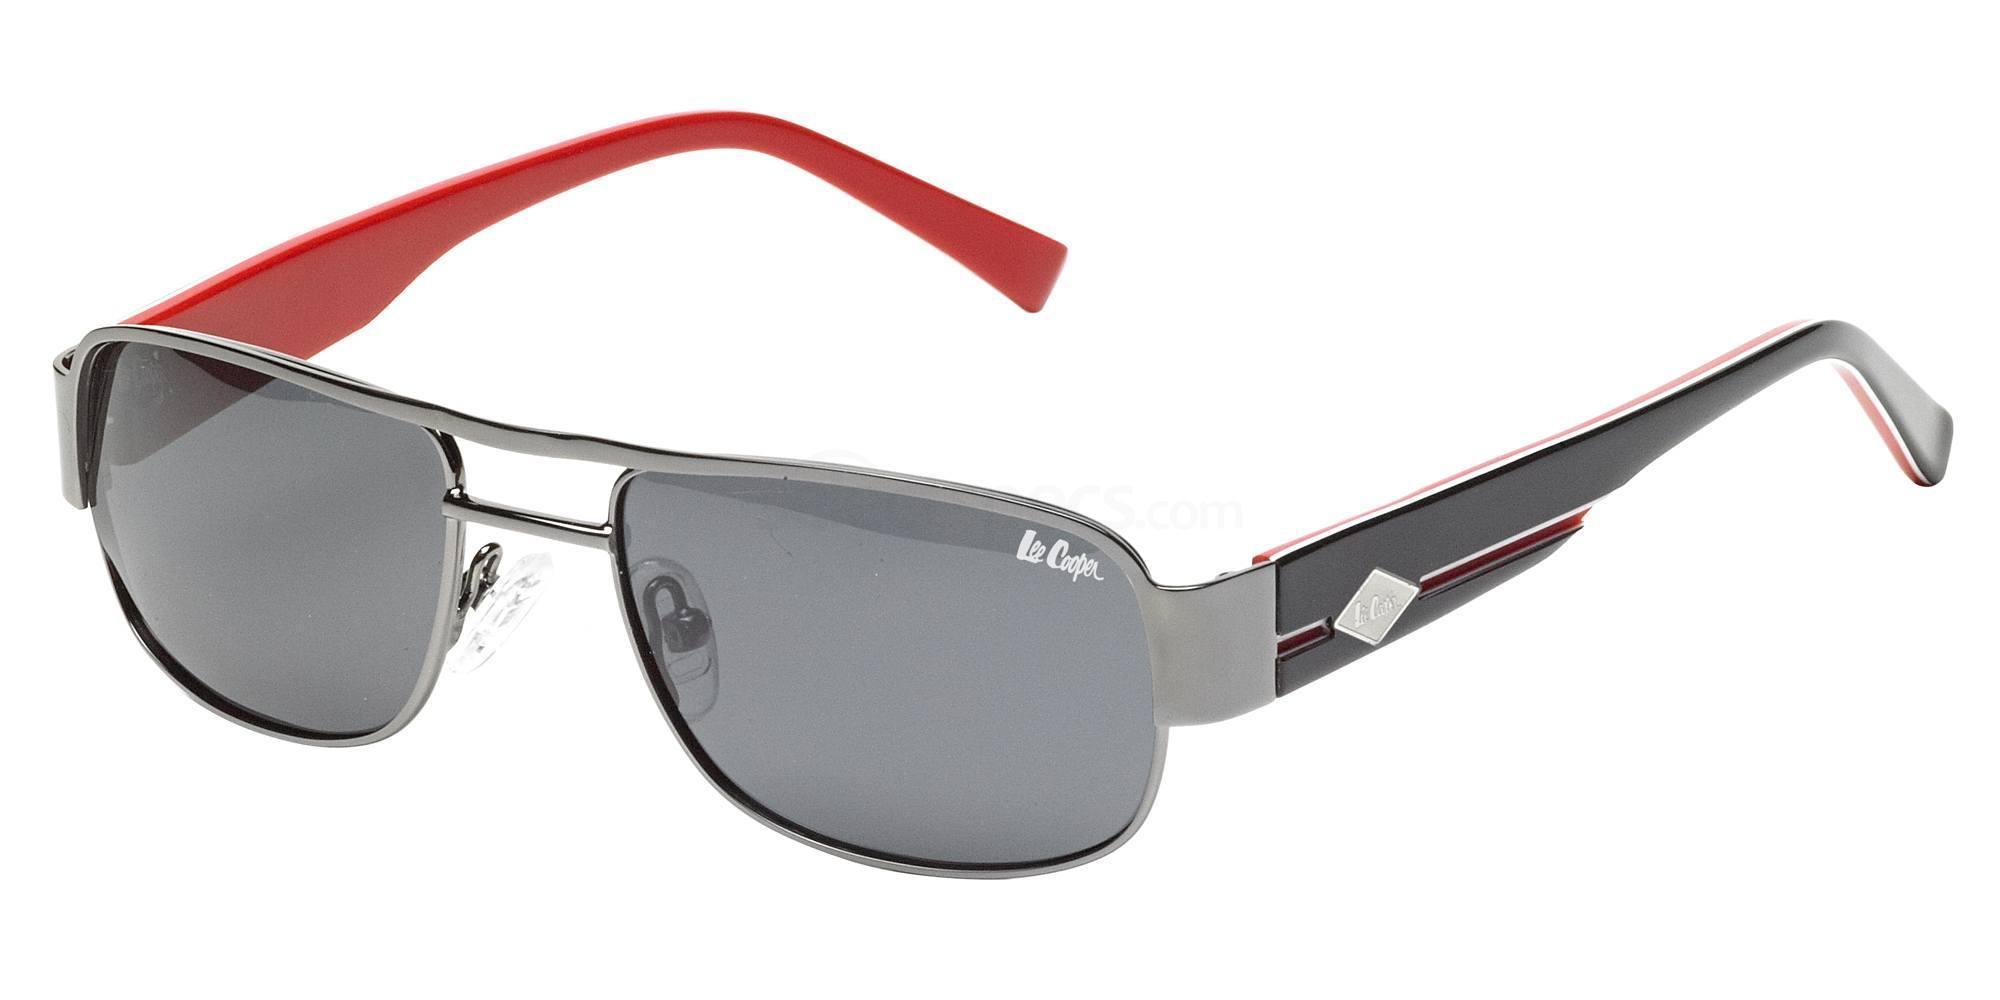 C1 SGLCK102 Sunglasses, Lee Cooper KIDS